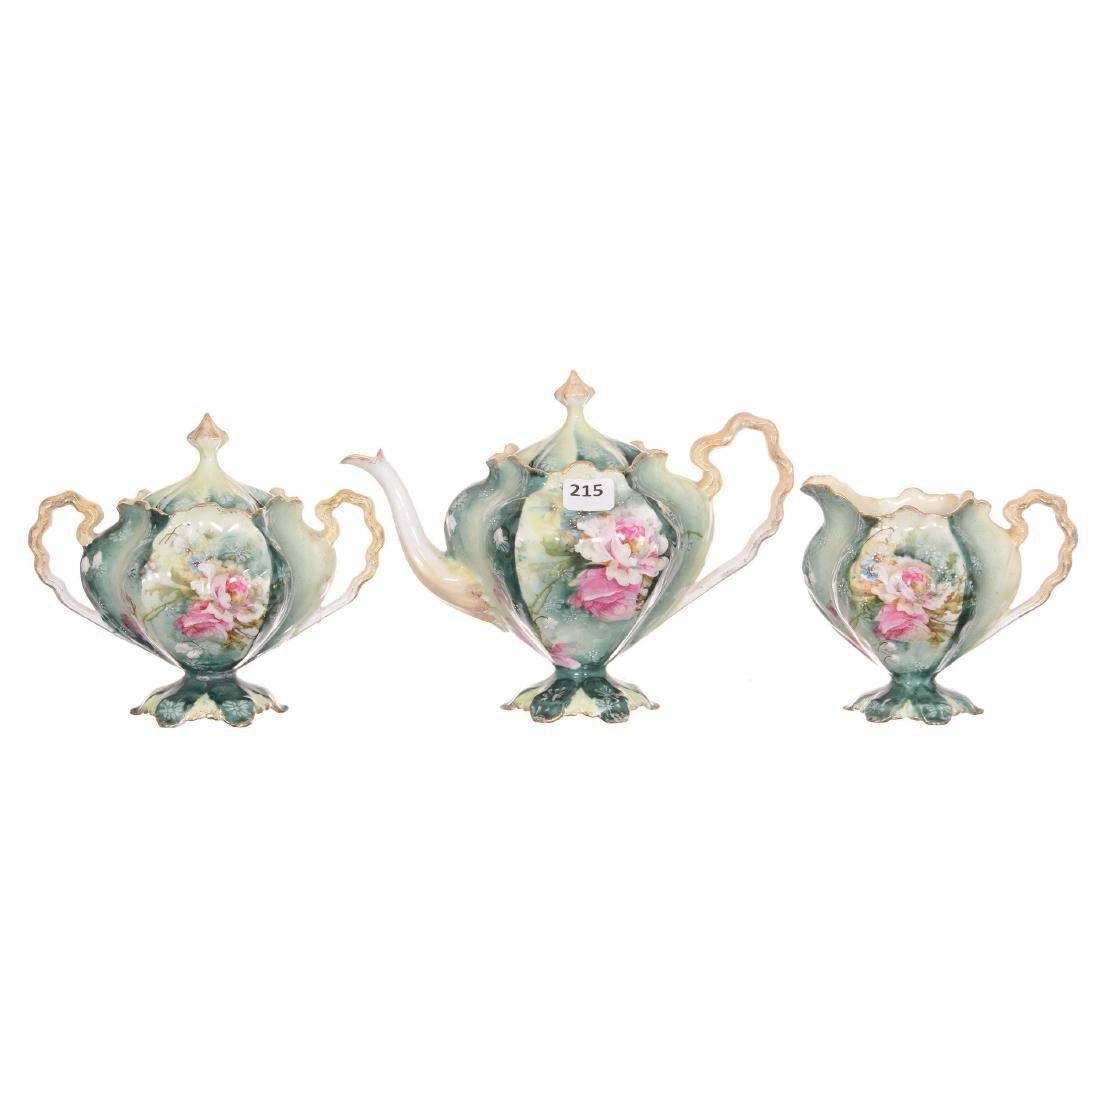 Unmarked Three Piece R.S. Prussia Tea Set